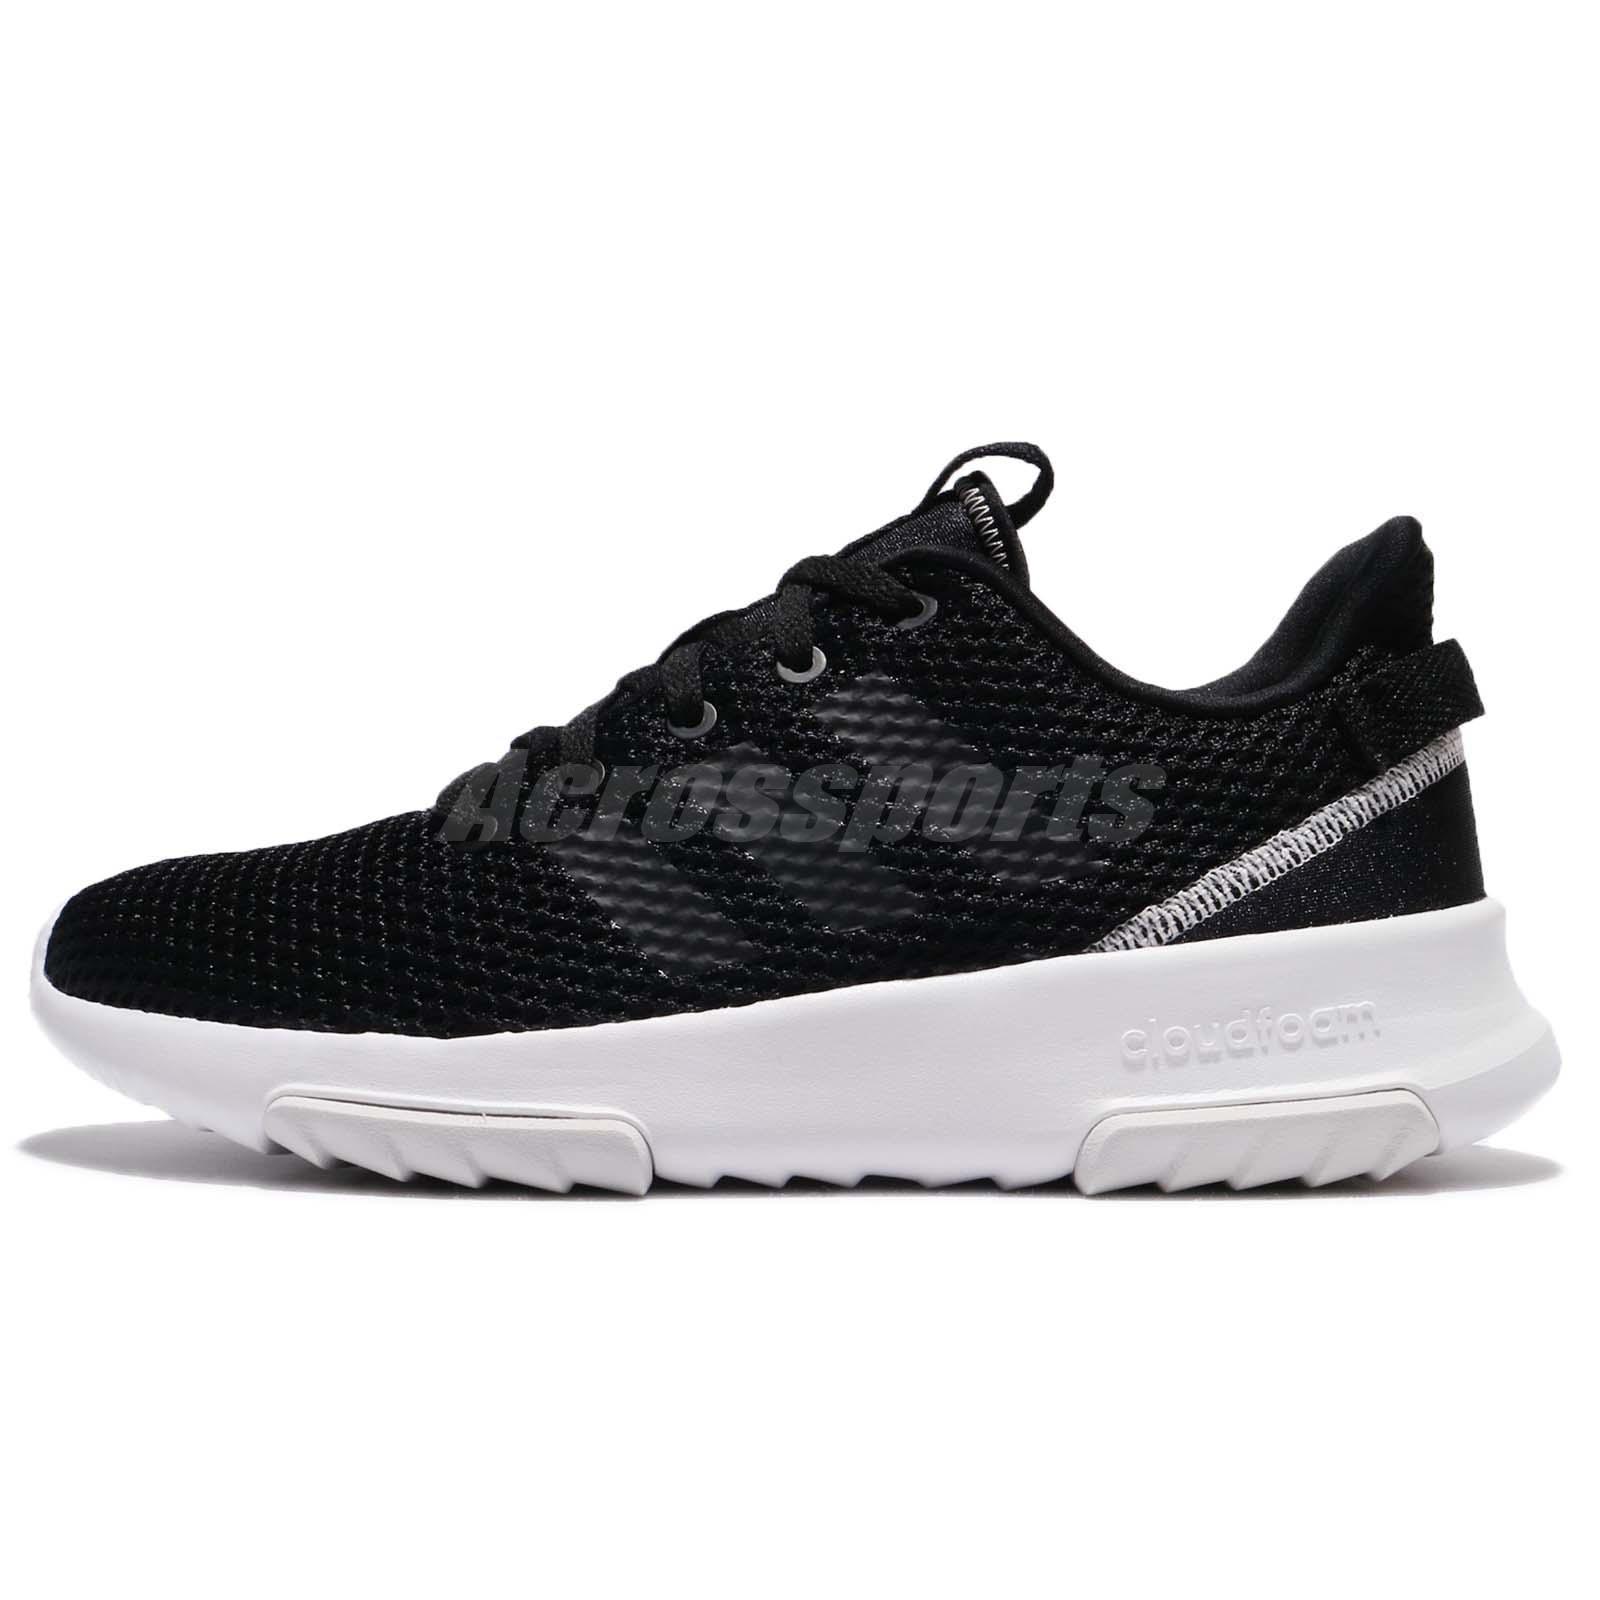 adidas cloudfoam lite racer aw4083 black womens shoes nz